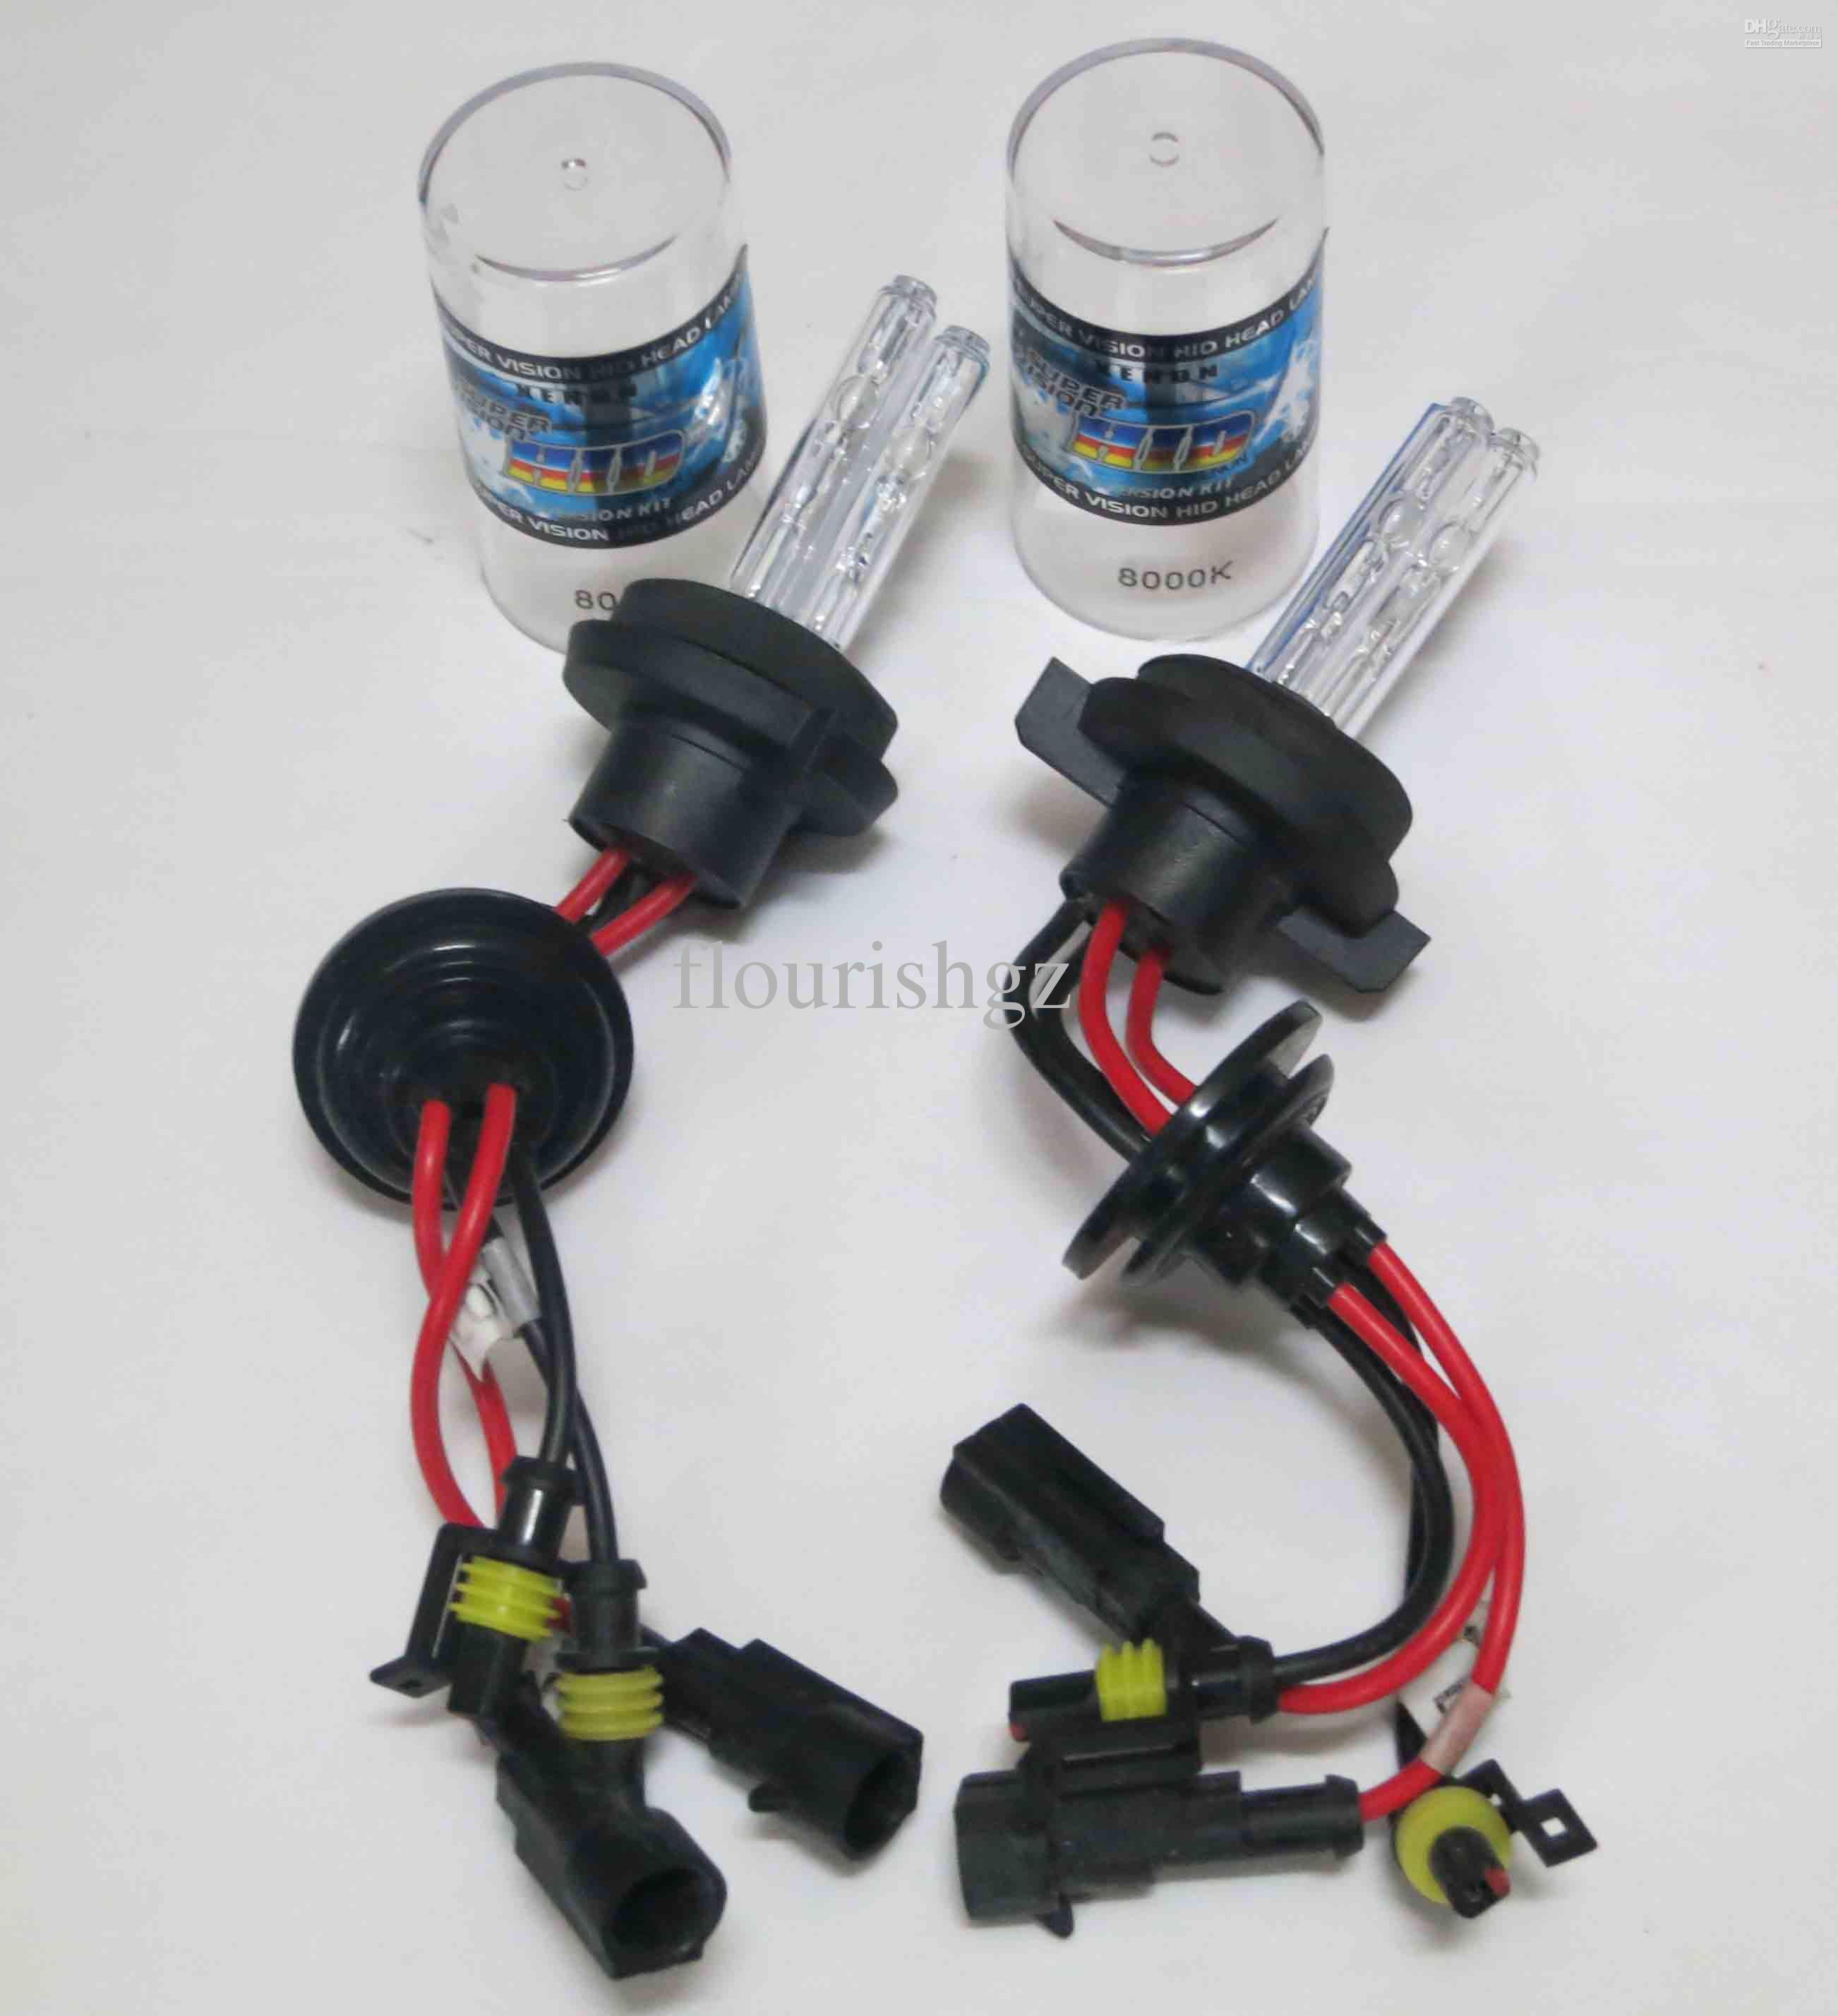 35W H4-4 Slanke voorschakelapparaten Dual Xenon Low Beam High Beam HID-kits H13-4 9004-4 9007-4 6K 8K 12V